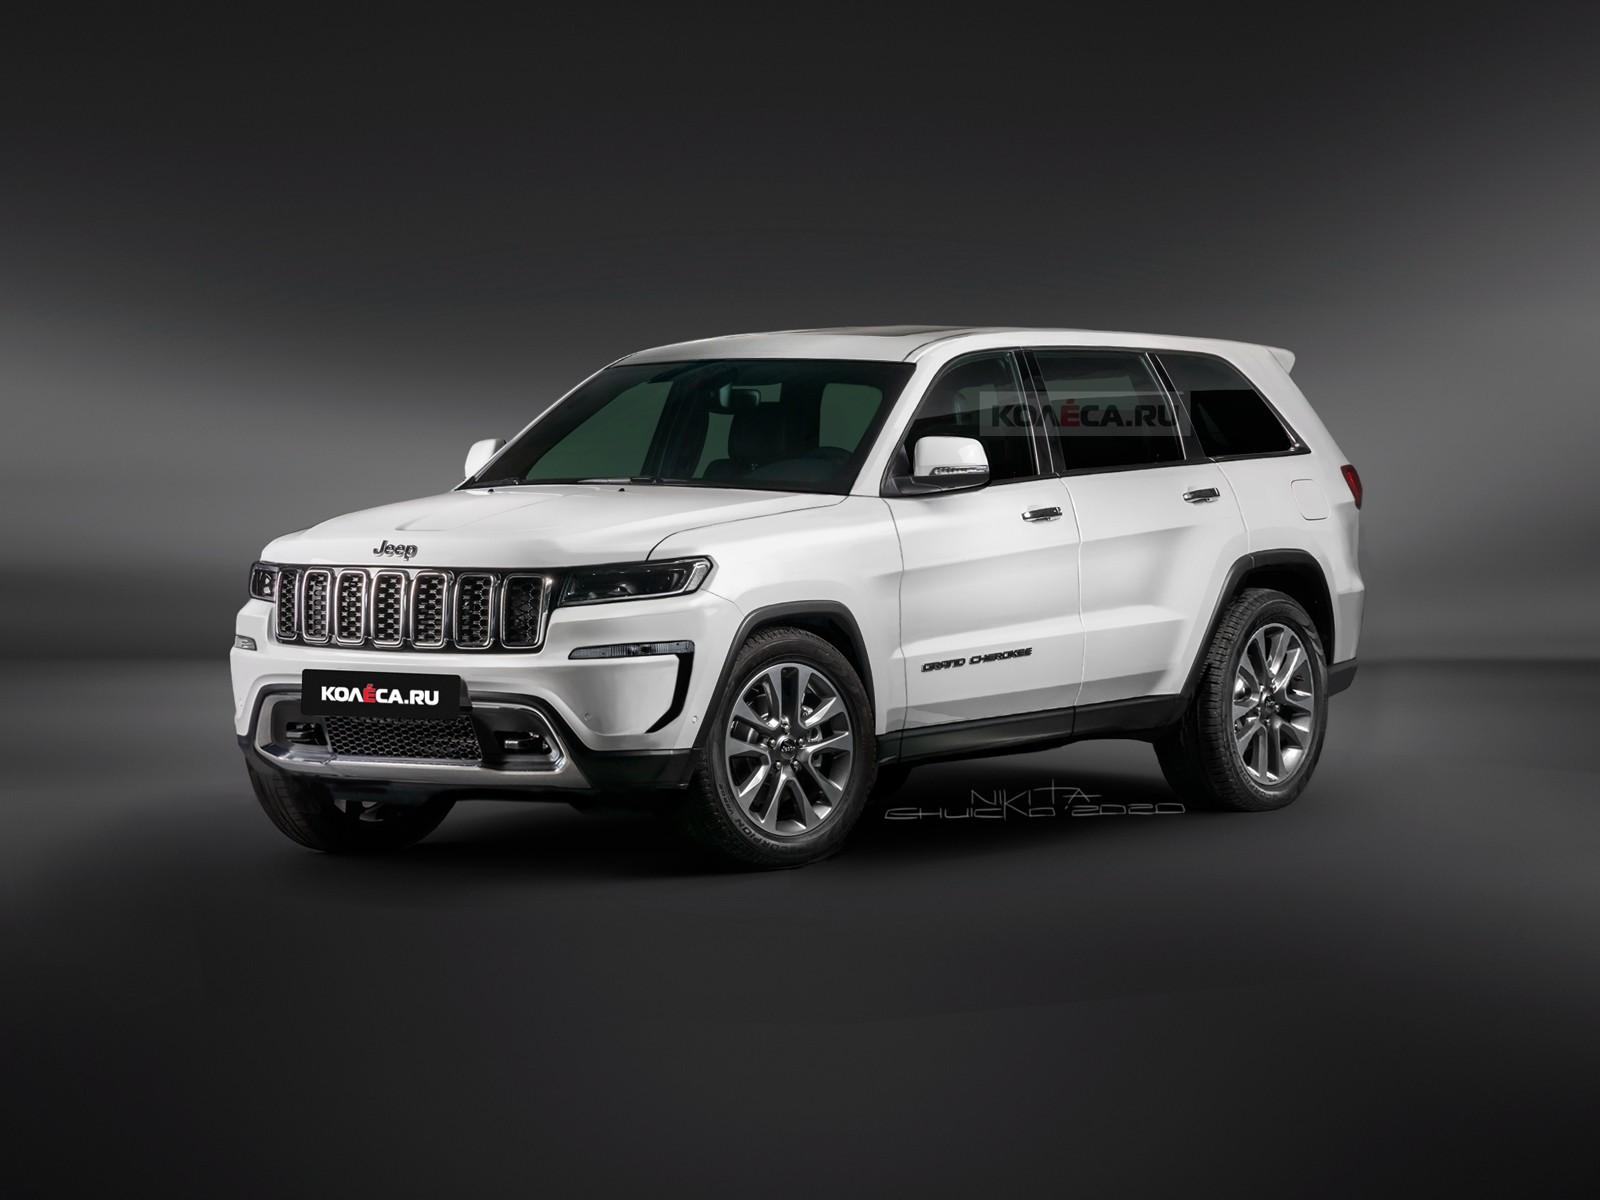 Jeep-Grand-Cherokee-1